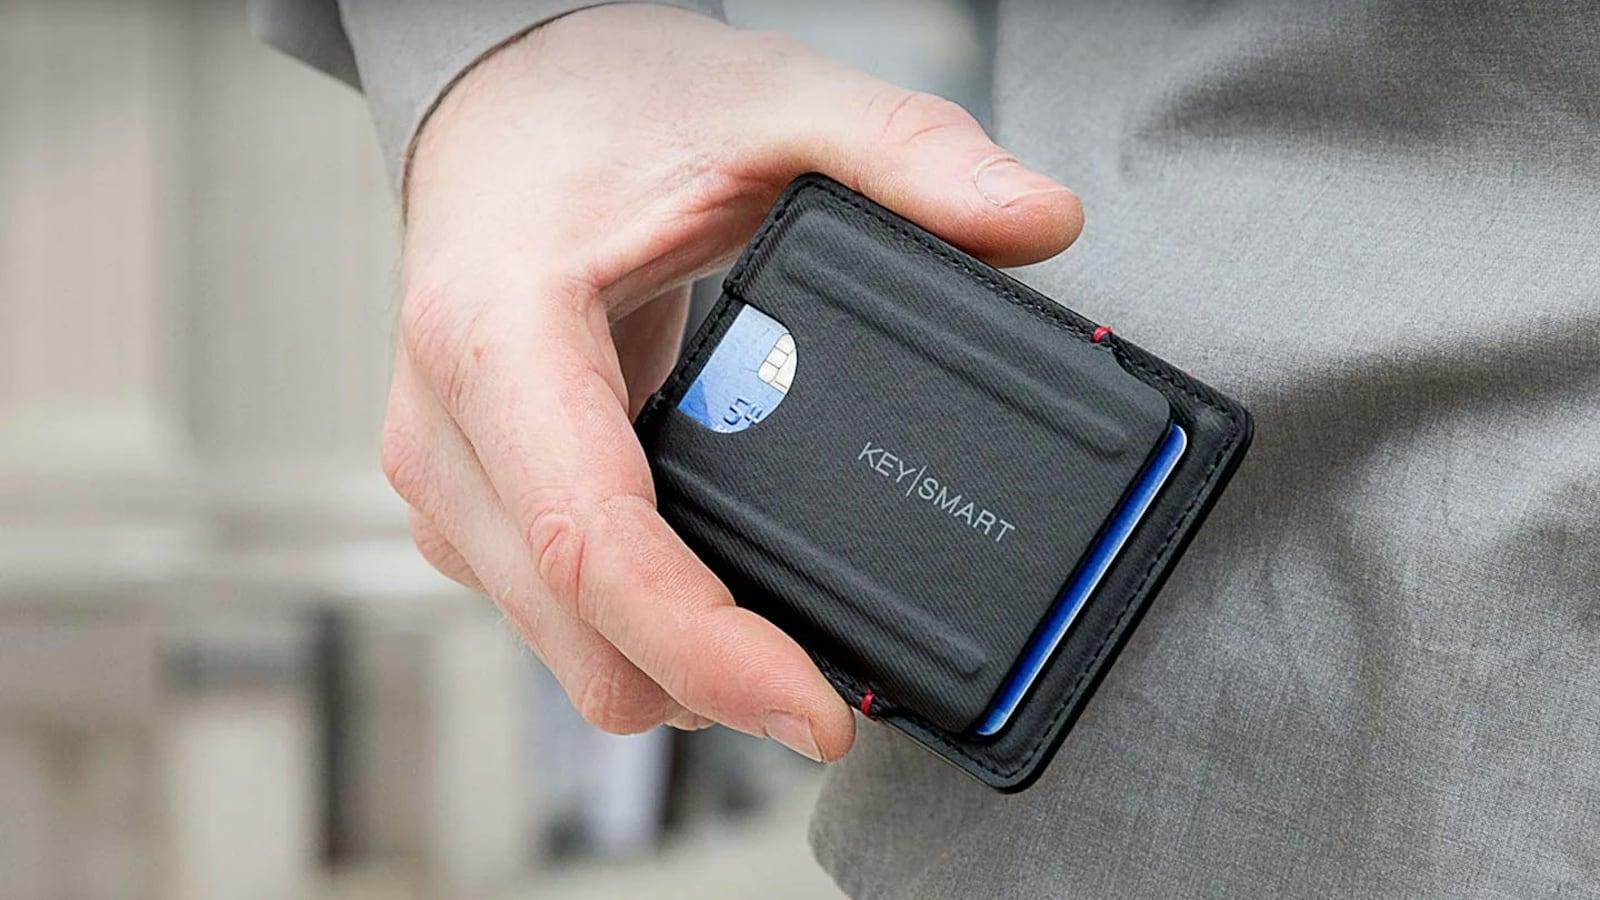 KeySmart Slim Wallet Urban Cardholder